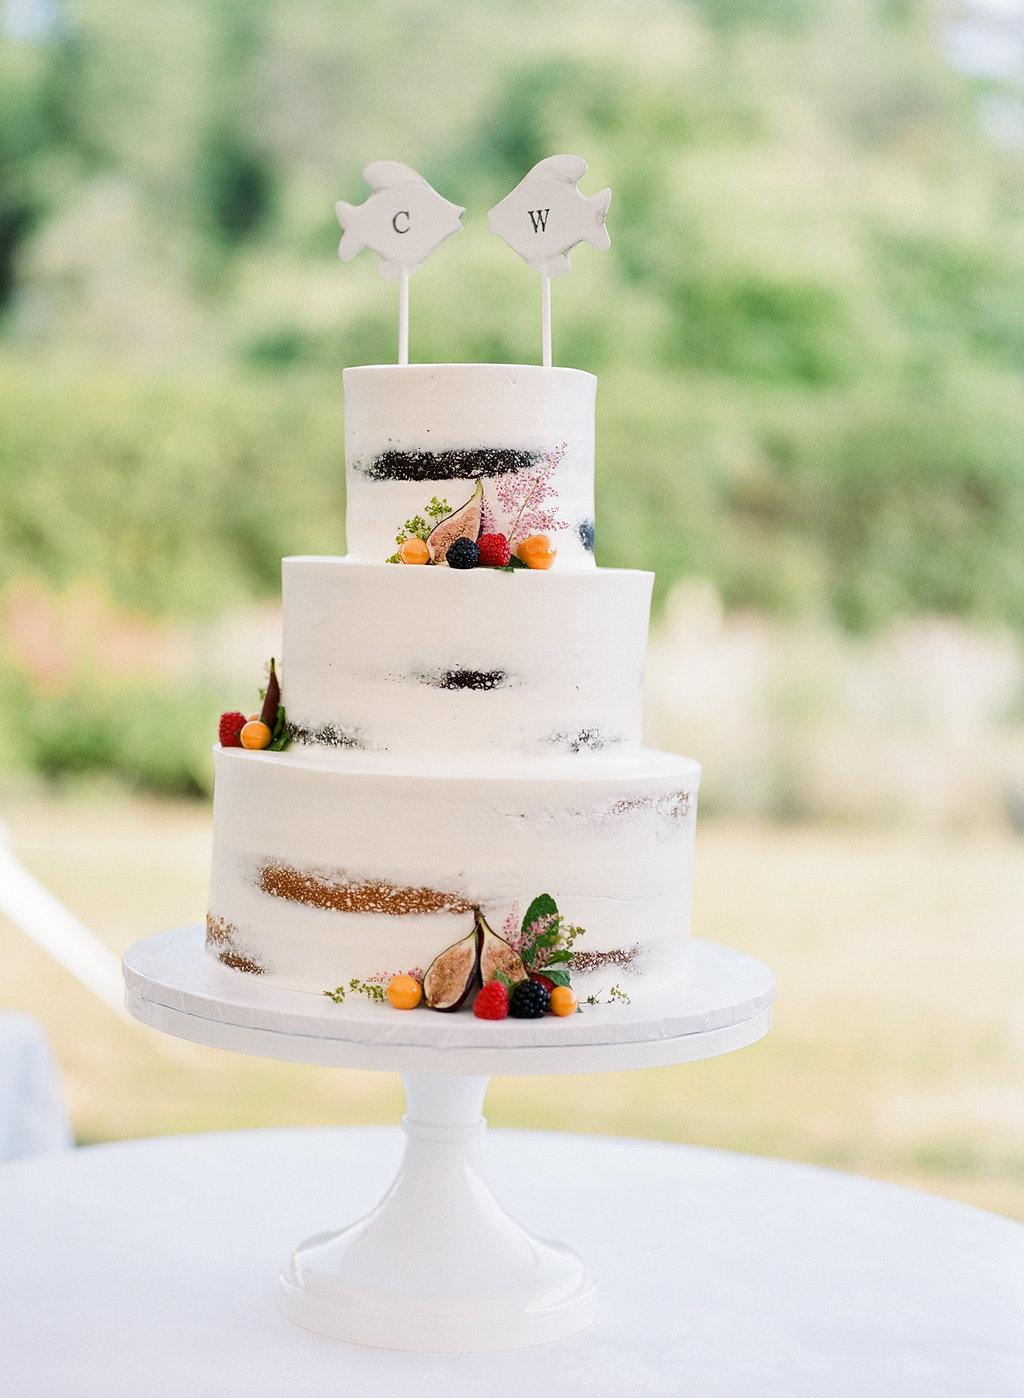 Cameron-Powel-Wes-Mize-wedding-20160618-469.jpg